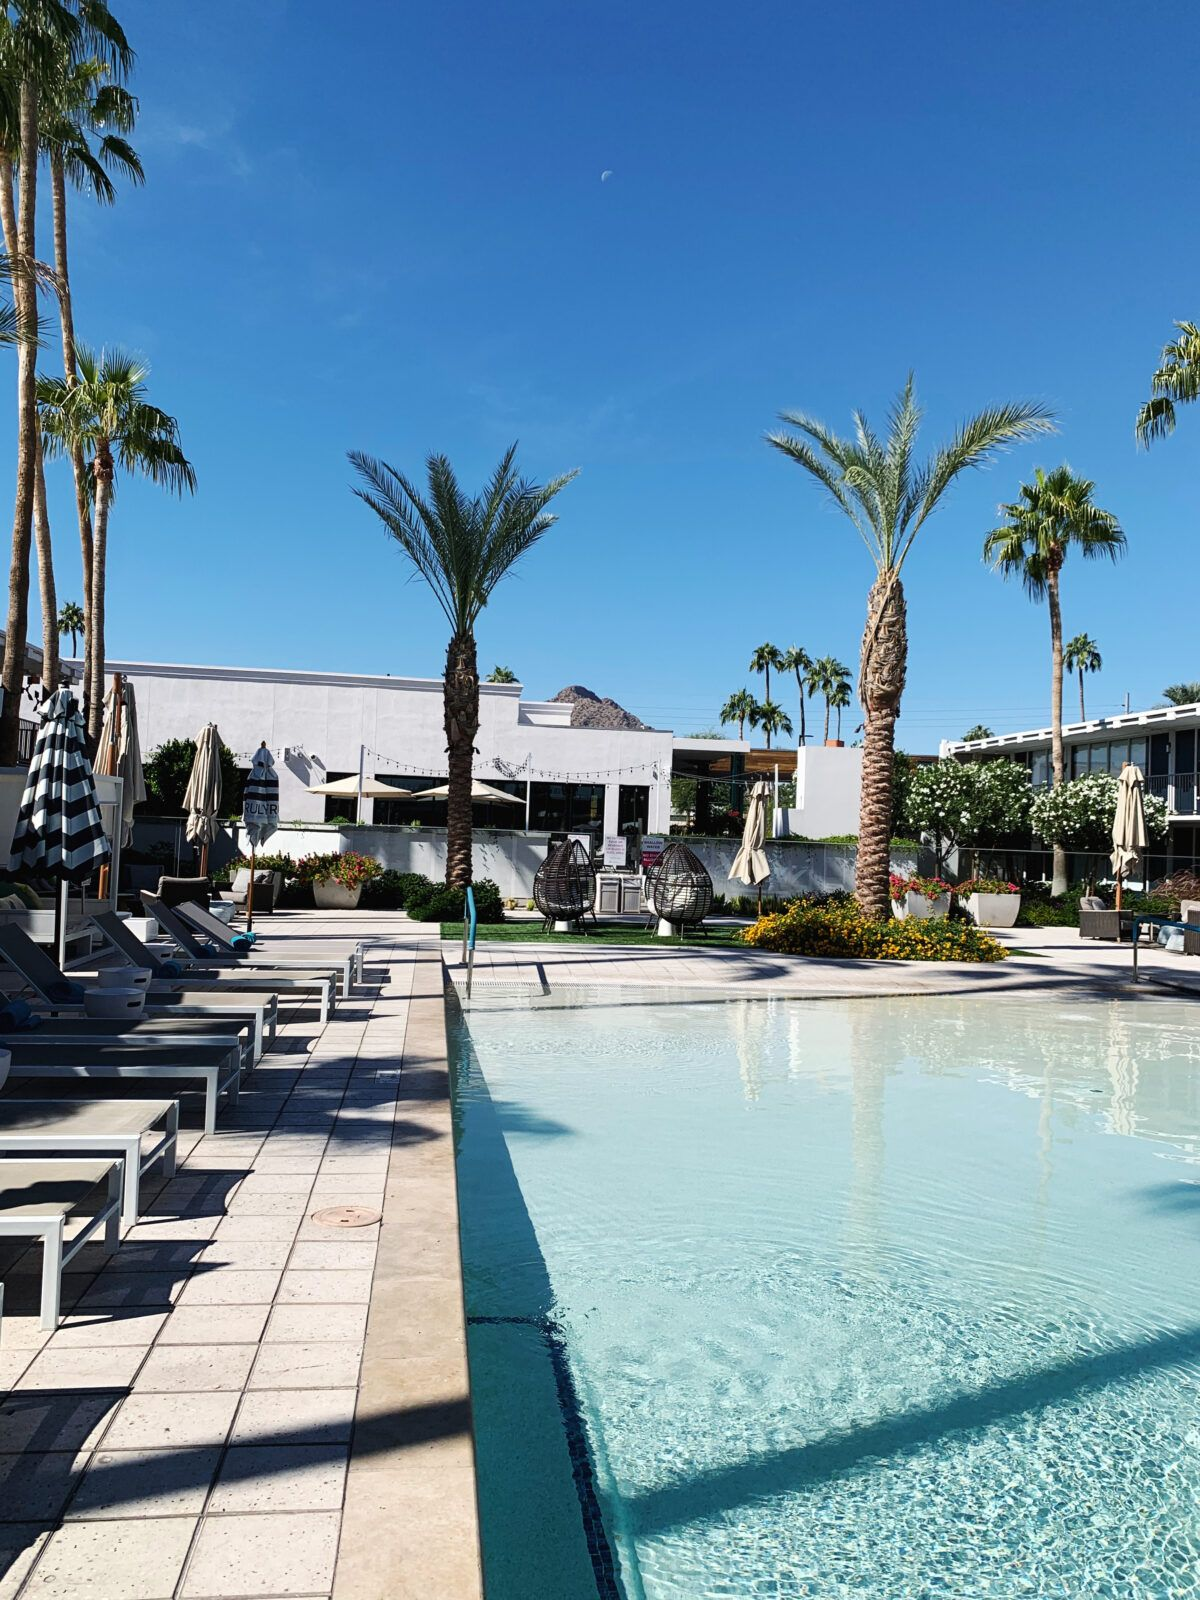 Boutique Hotel In Scottsdale Arizona Boutique Hotel Scottsdale